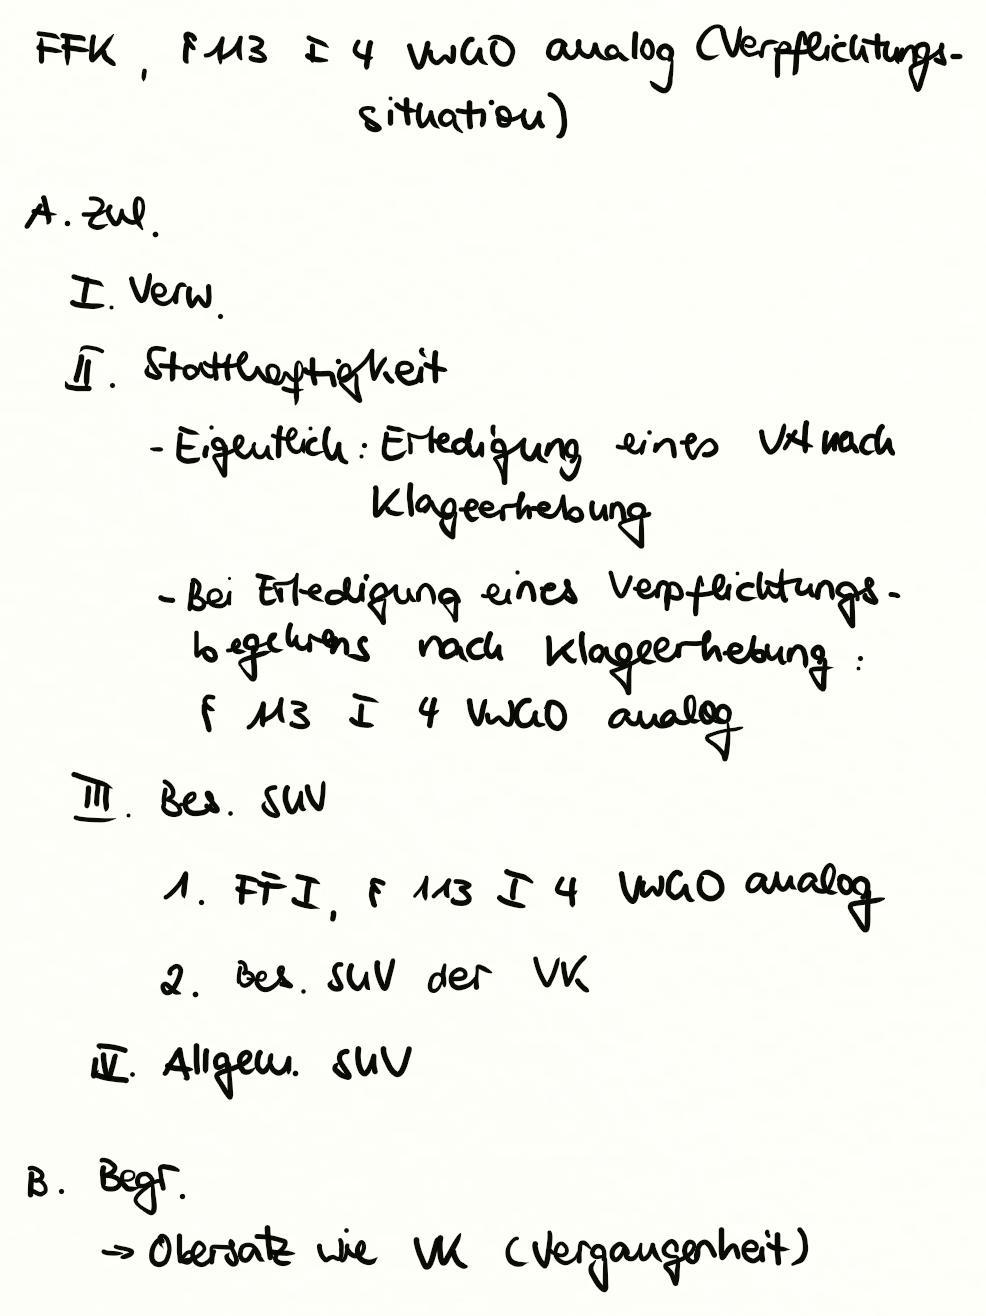 Fortsetzungsfeststellungsklage 113 I 4 Vwgo Analog